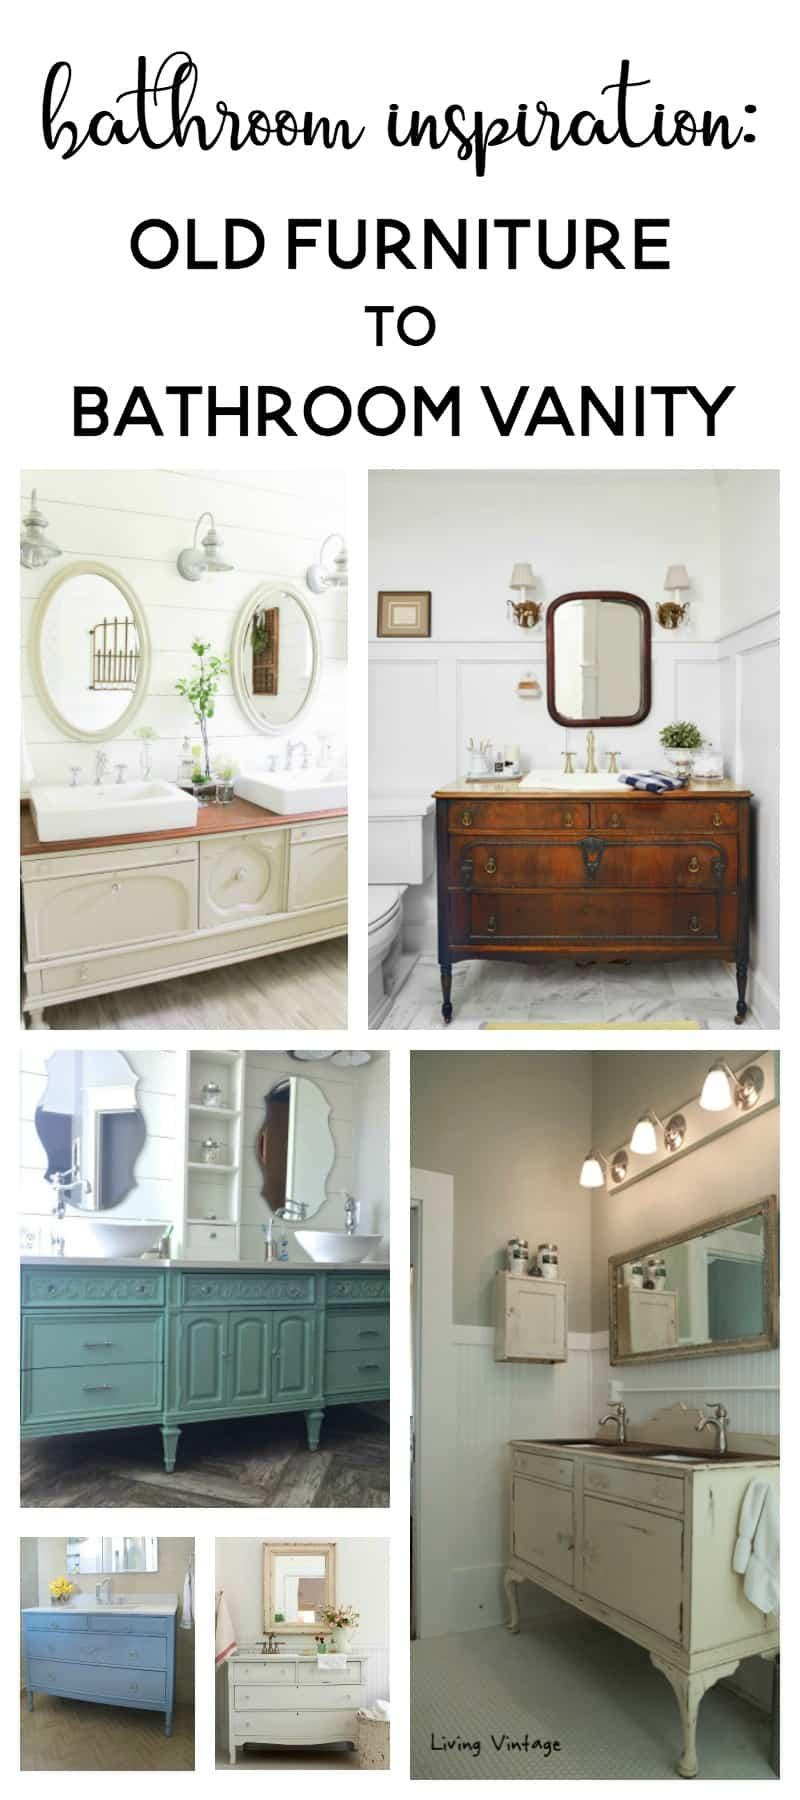 bathroom ideas | bathroom remodel | bathroom vanity | bathroom vanity ideas | bathroom vanity diy | diy bathroom vanity | vanity from old dresser diy | vanity ideas | diy vanity | old dresser ideas | diy bathroom